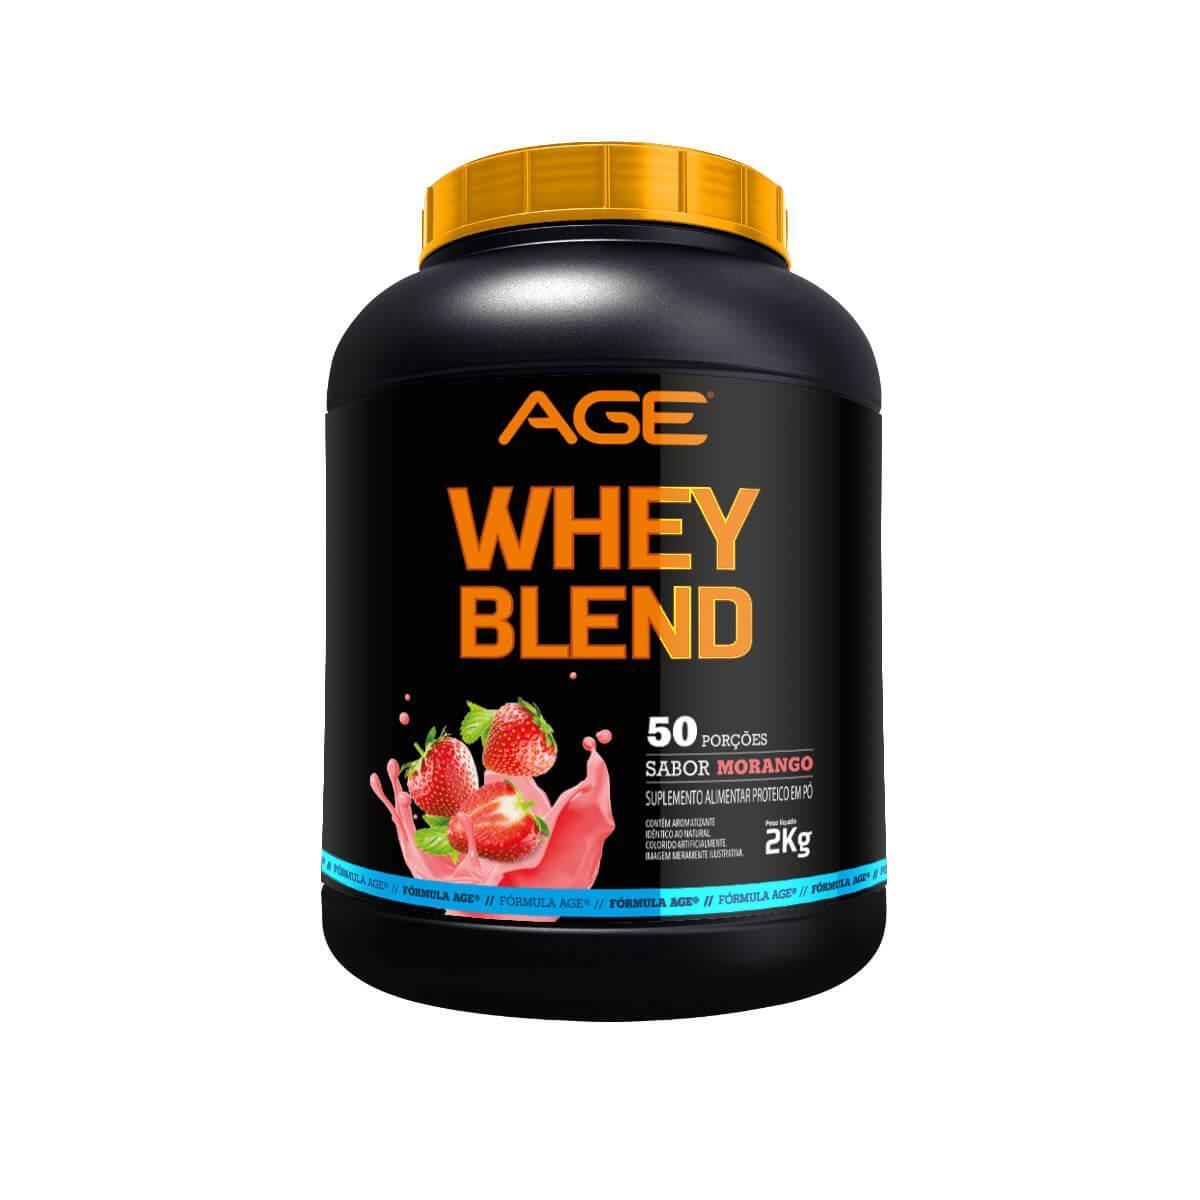 WHEY BLEND AGE (2Kg) - Morango - AGE